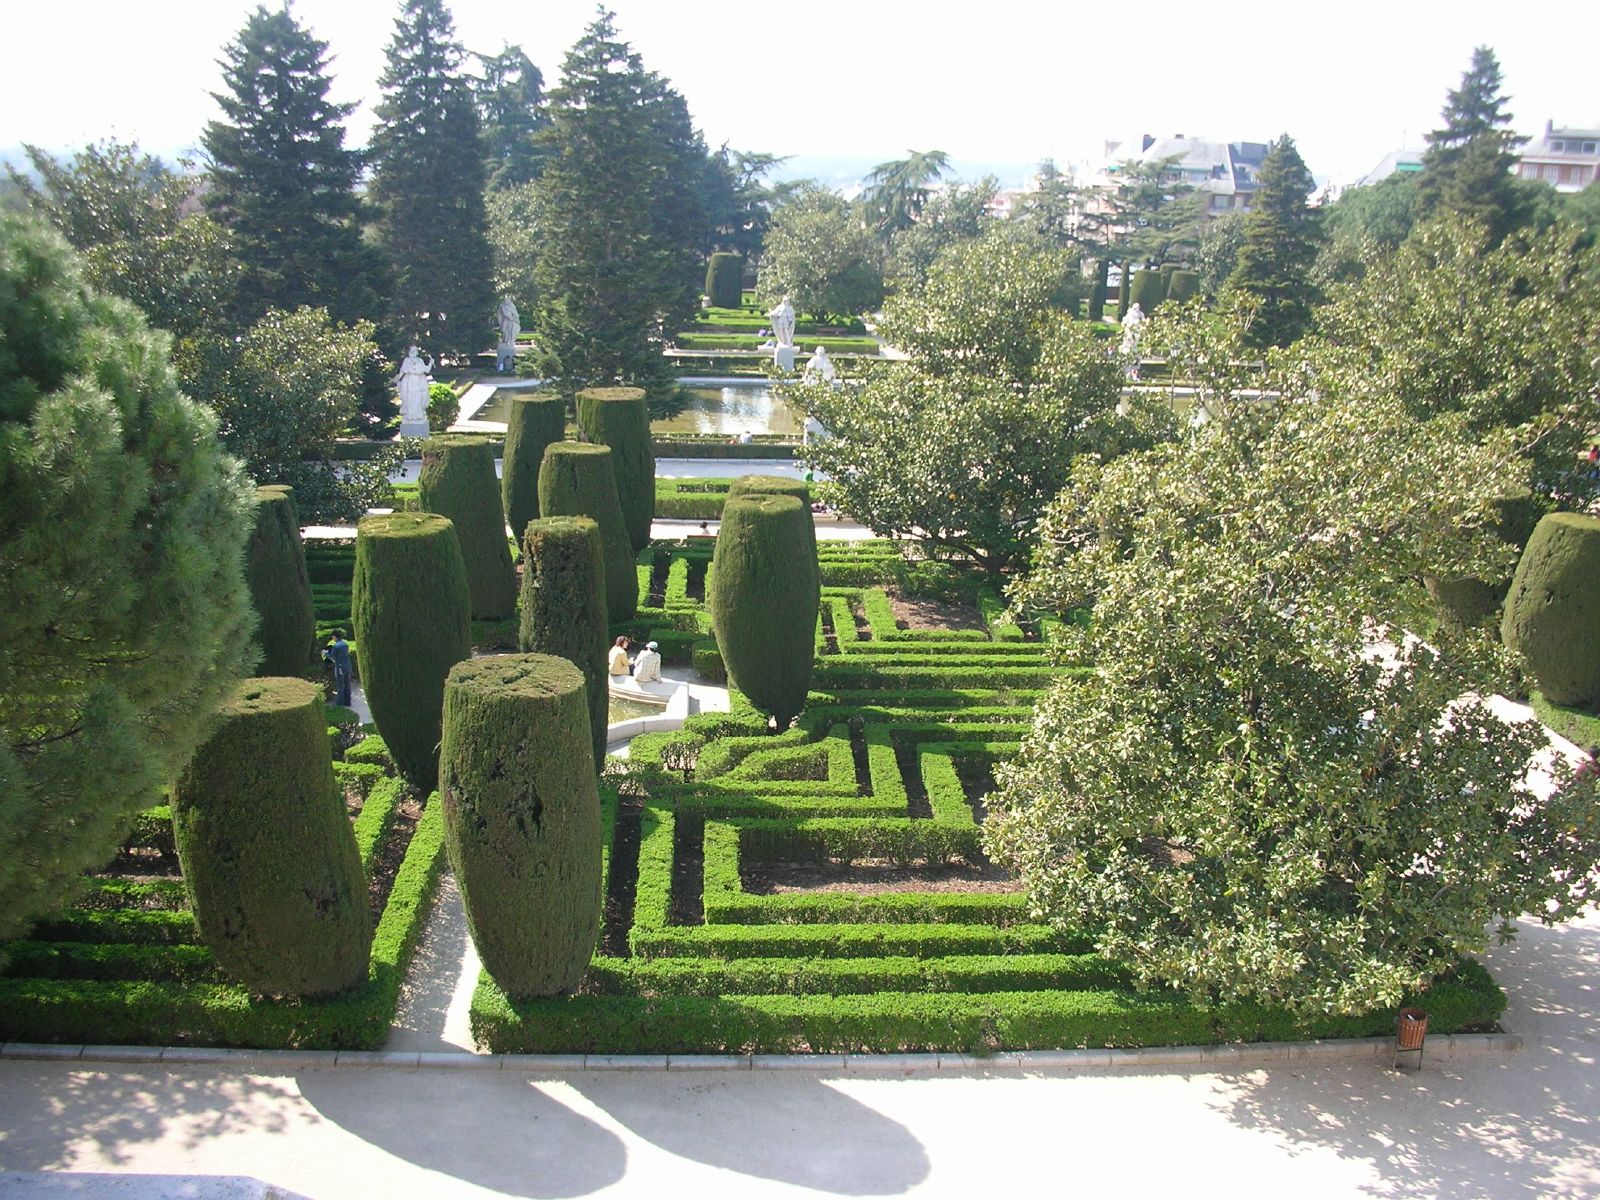 Jardines de Sabatini and Campo del Moro, Madrid